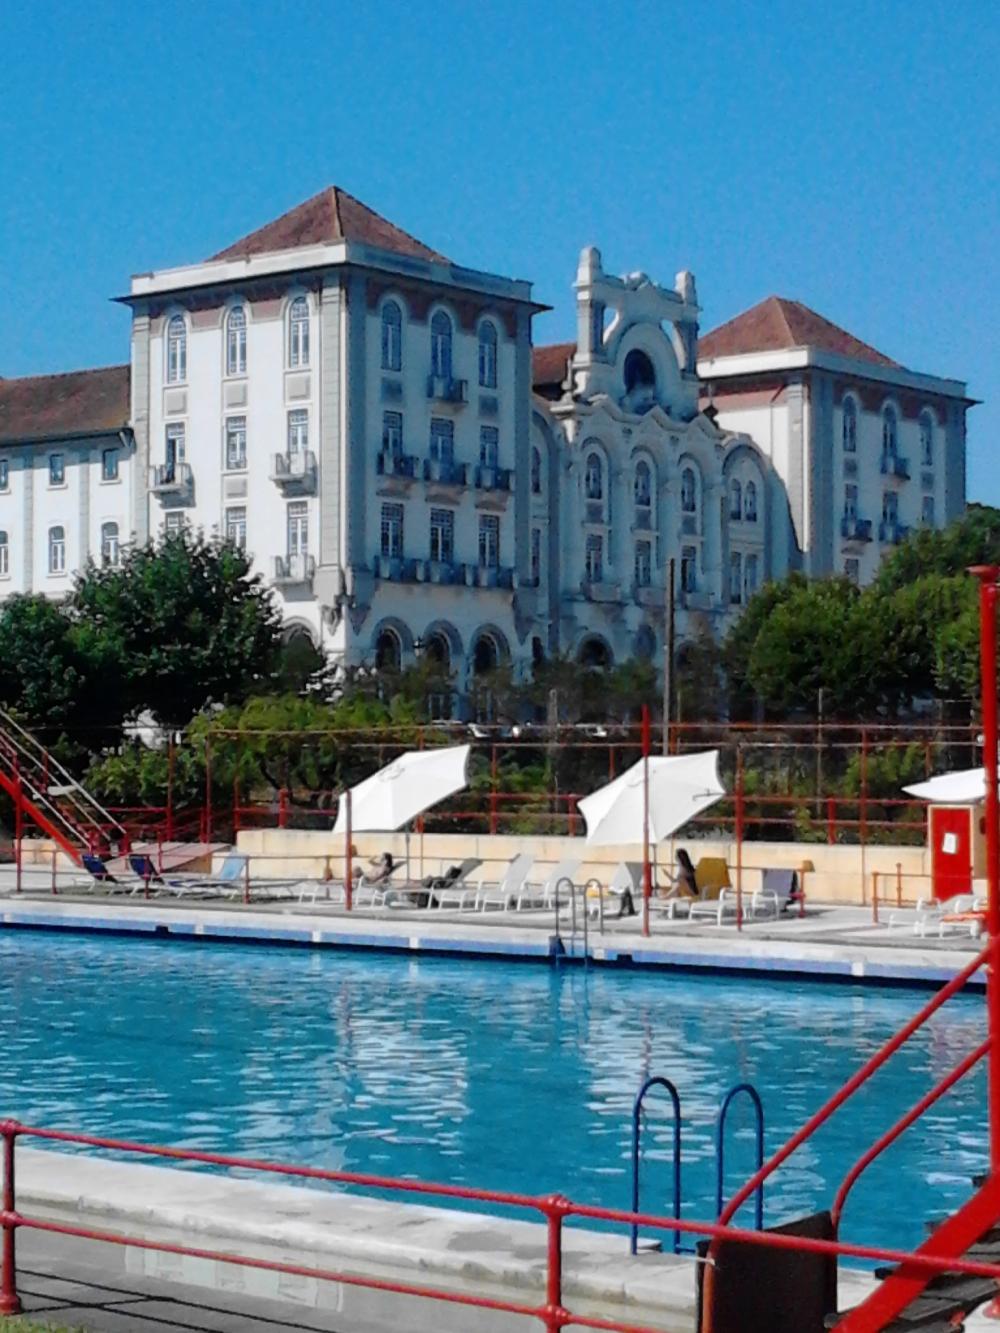 Piscina e Hotel Palace da Curia